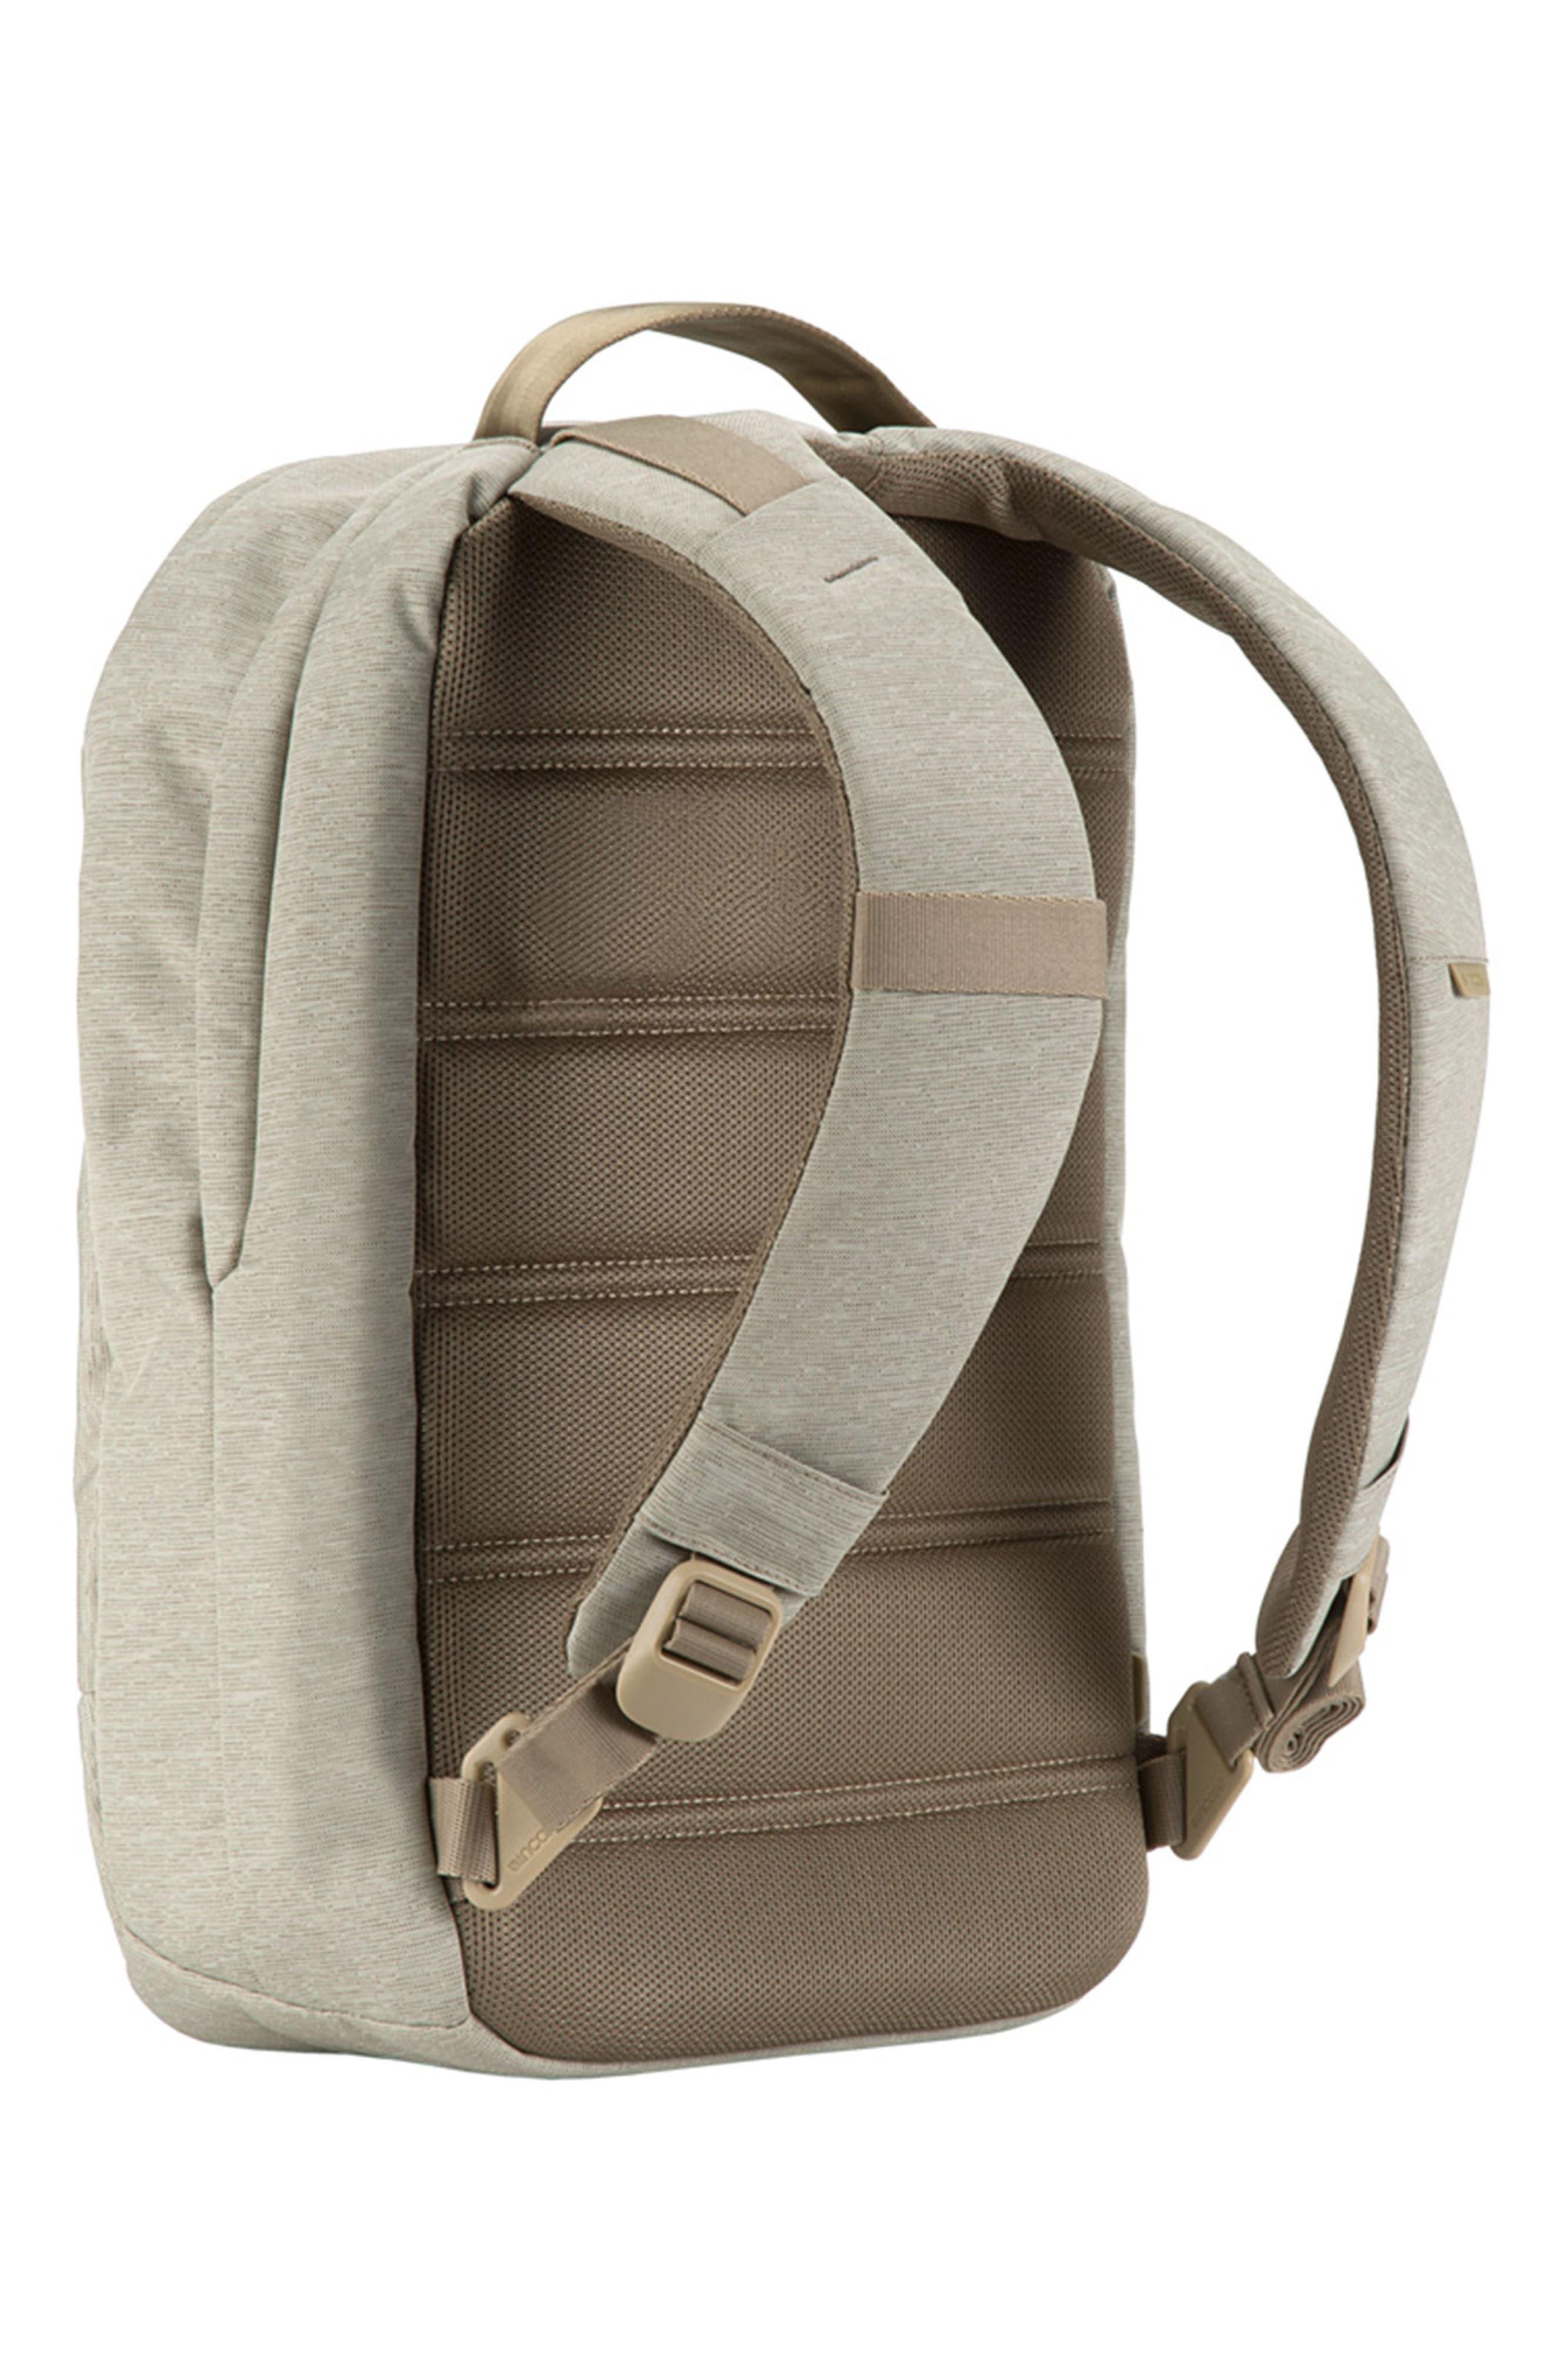 City Compact Backpack,                             Alternate thumbnail 4, color,                             Heather Khaki